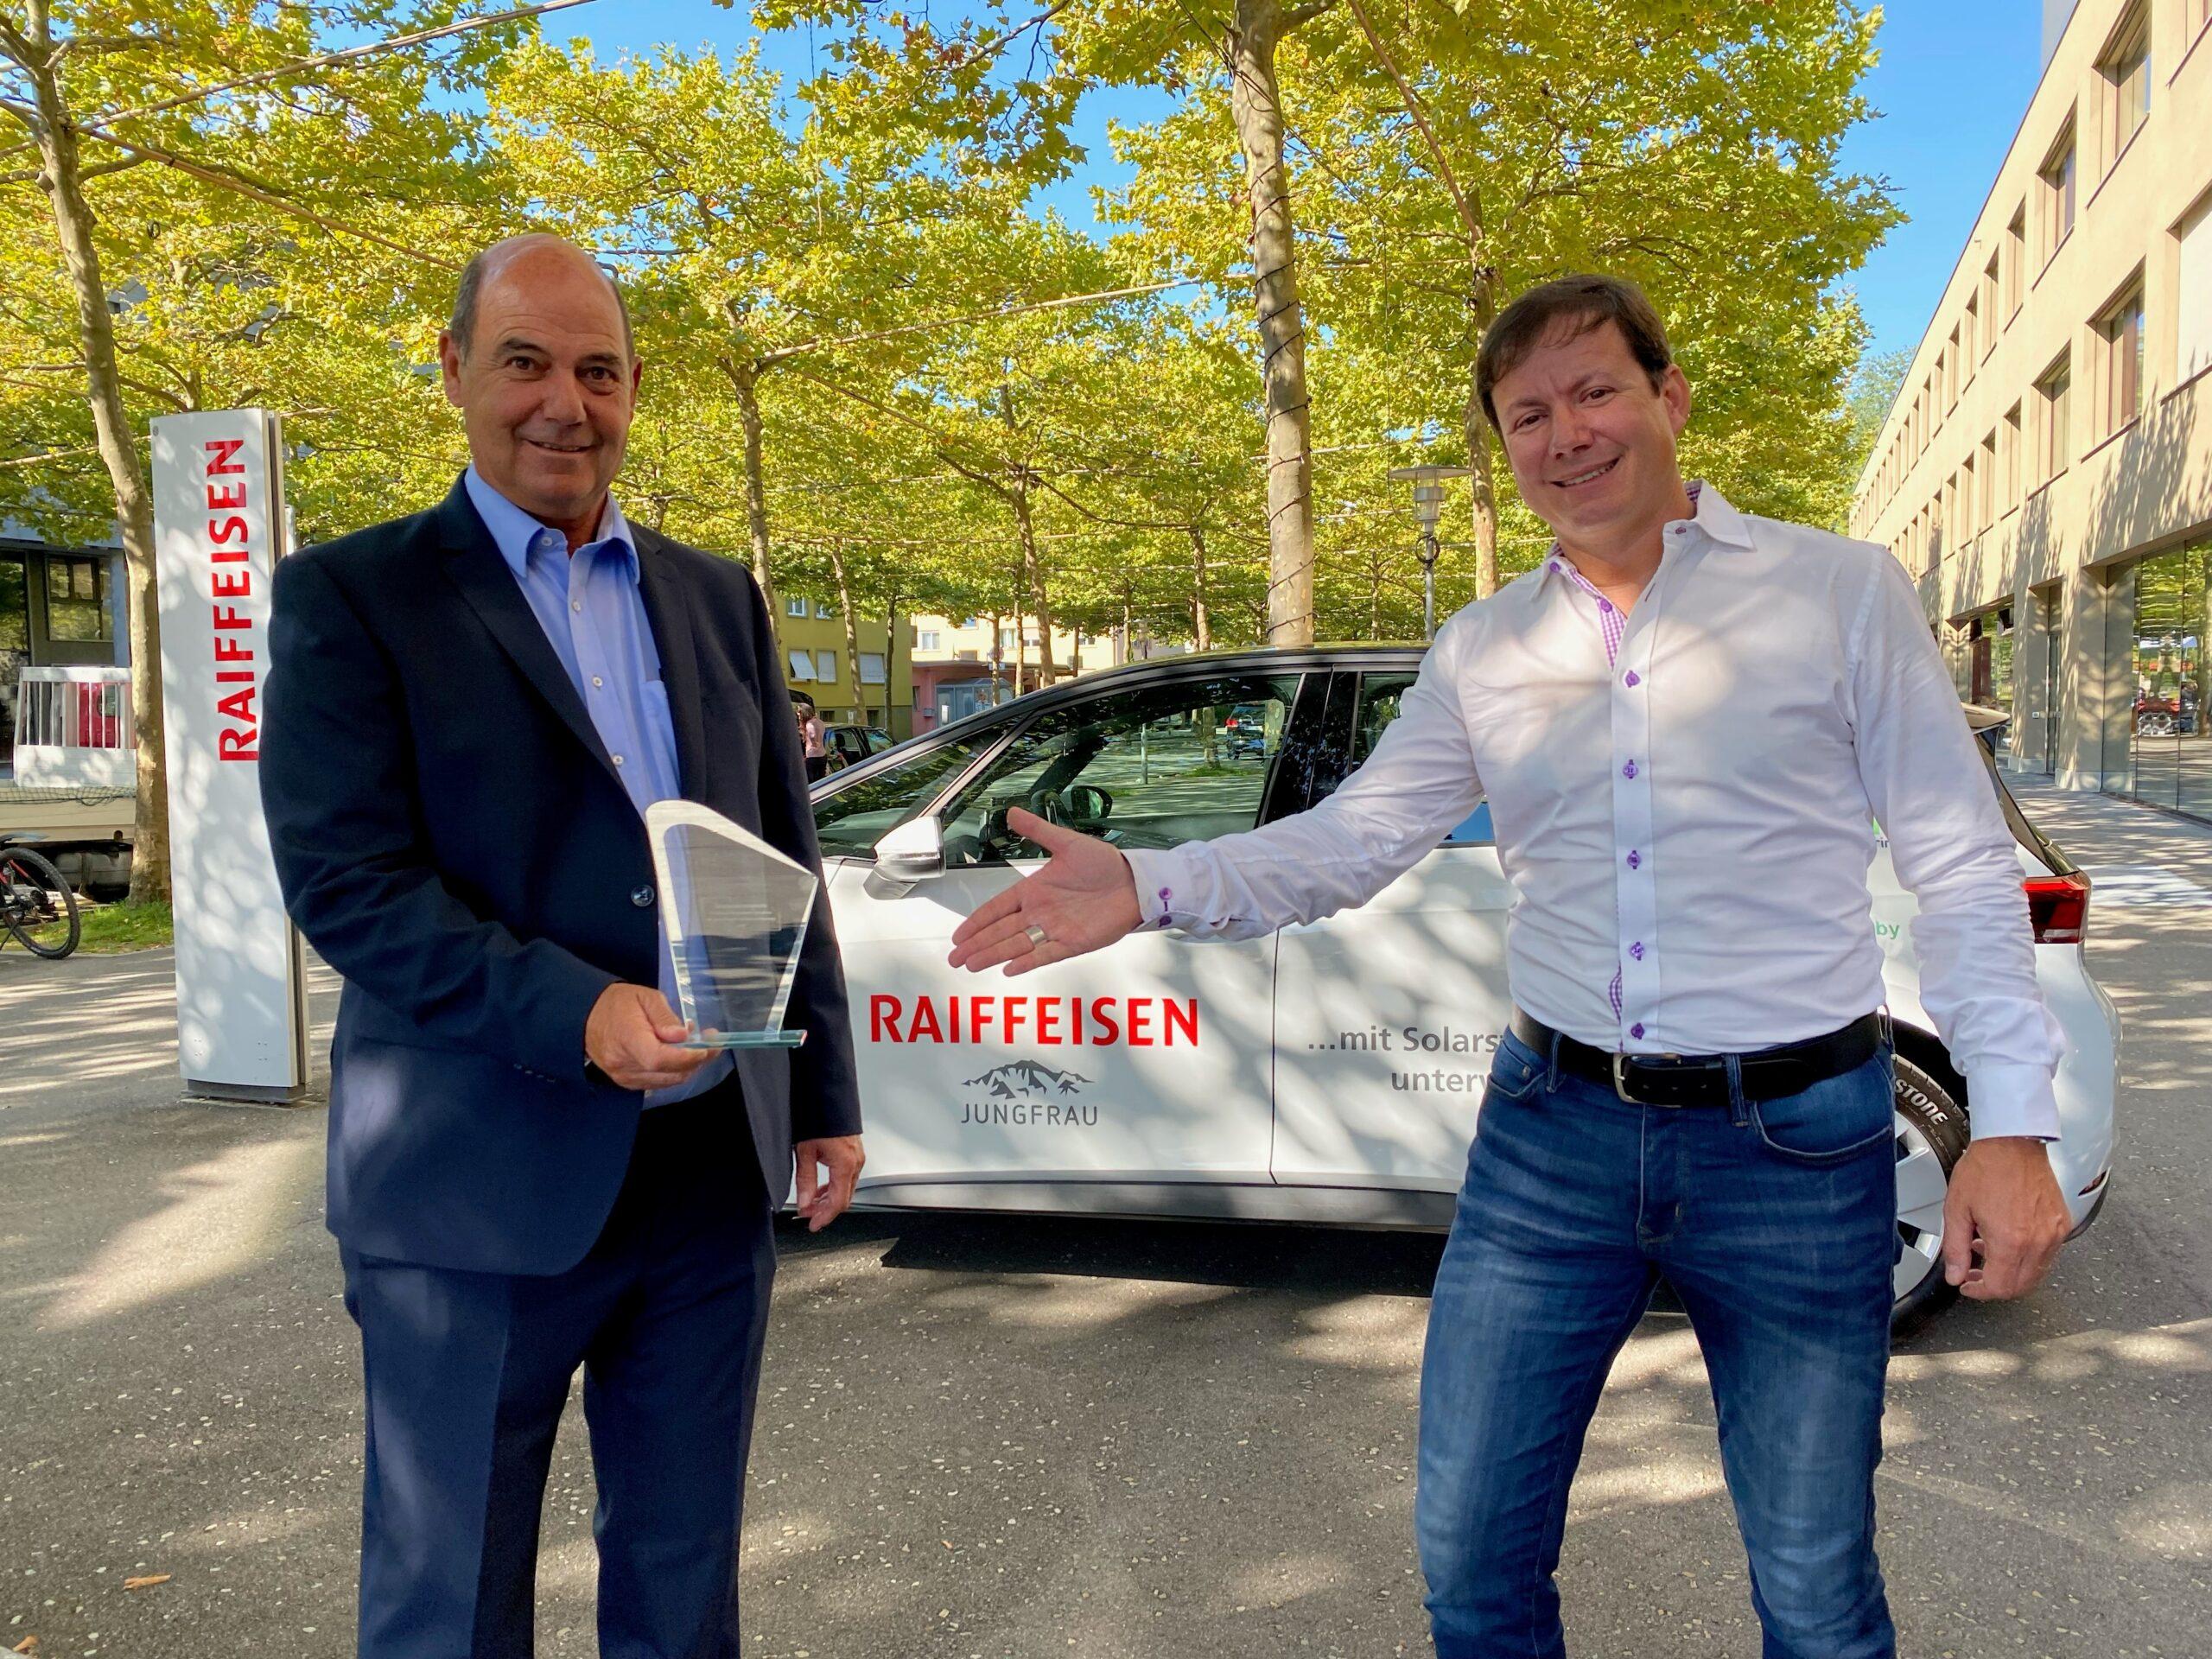 edrive carsharing der Raiffeisenbank Jungfrau gewinnt Innovationspreis 2021